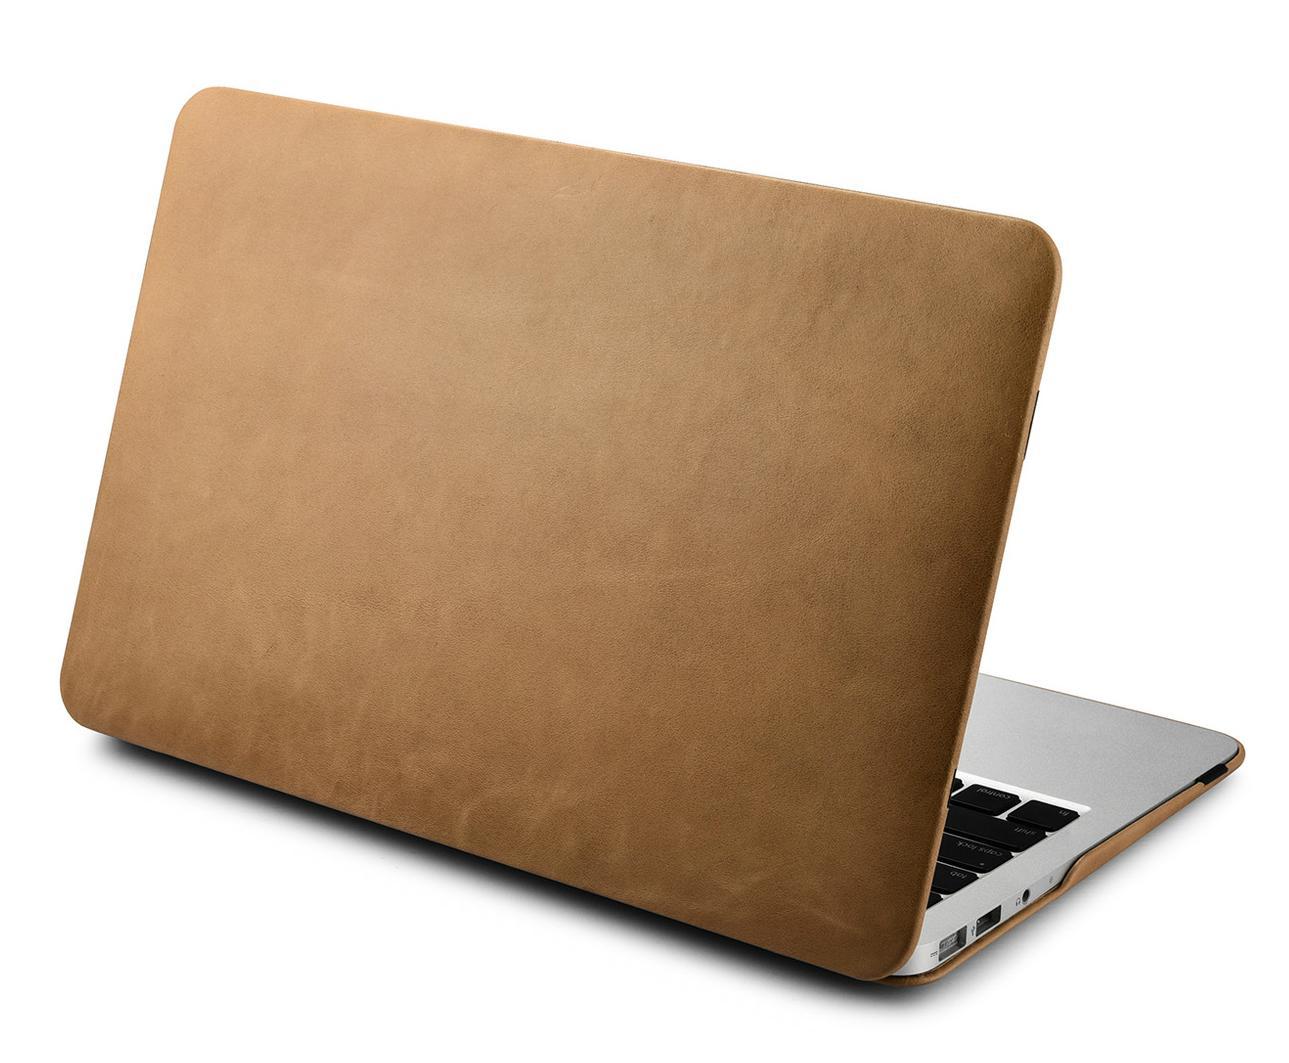 iCarer MacBook Air 11 inch Vintage Book Style Slim Folio Case 1